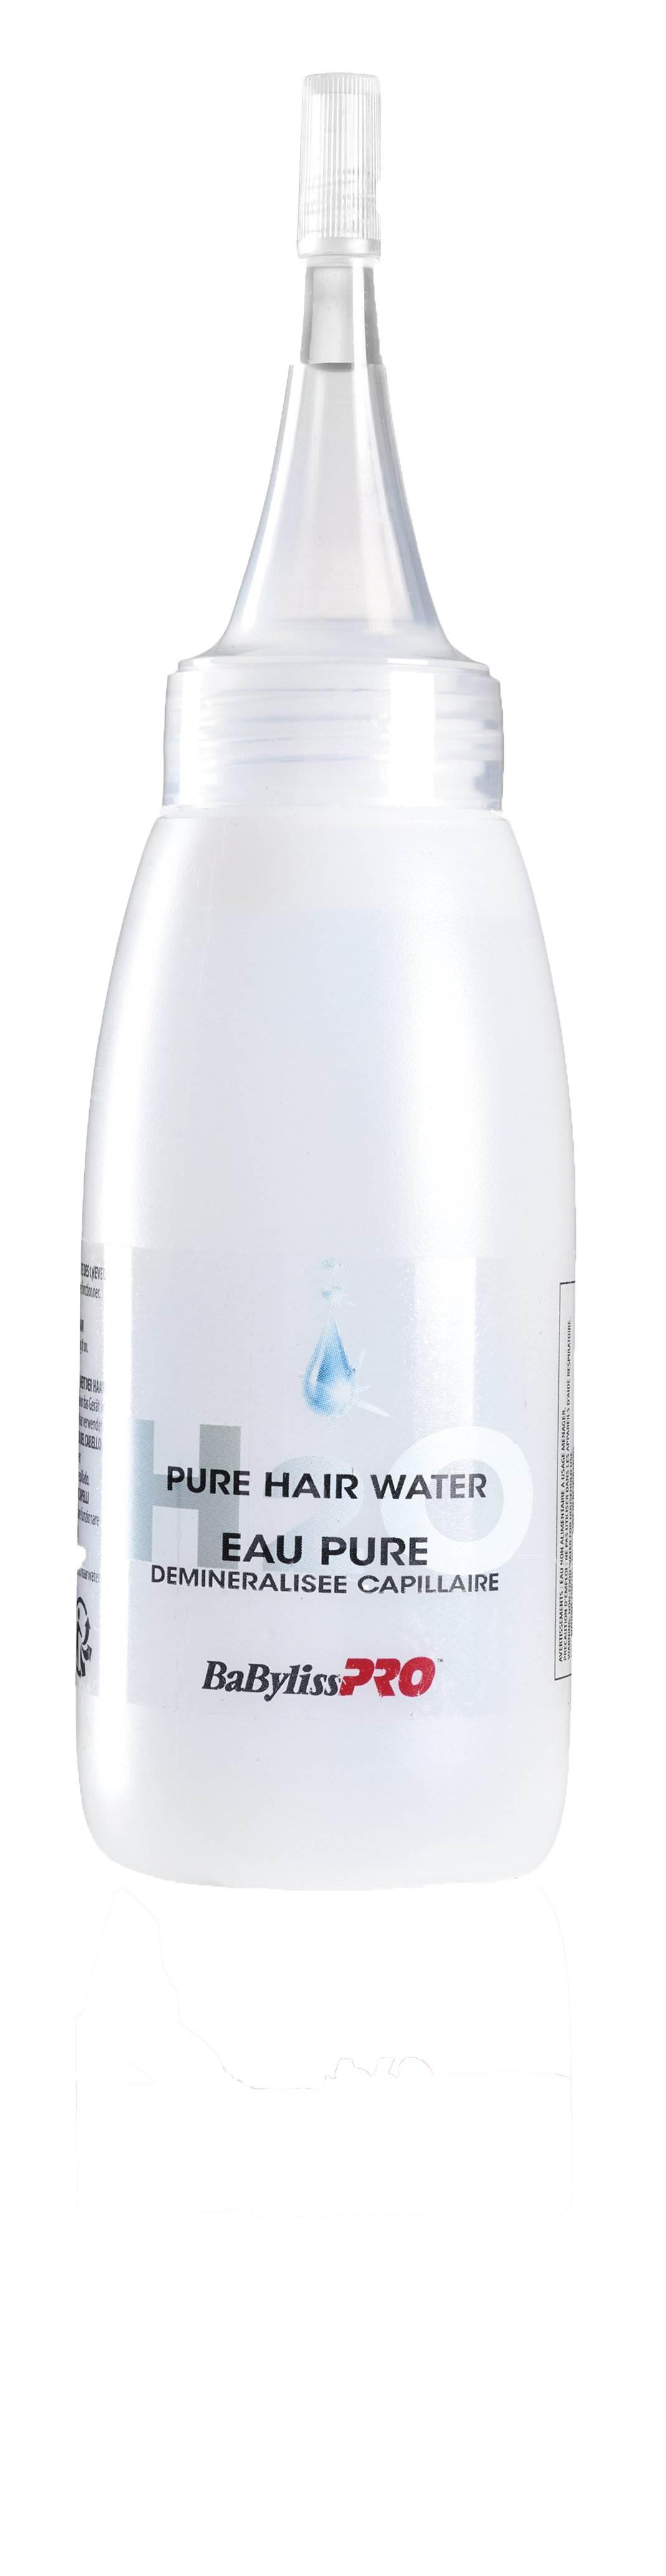 M2394E BaByliss PRO Pure Hair Water H2O 636784110394548316. BAB2665SE 57fdd77798e